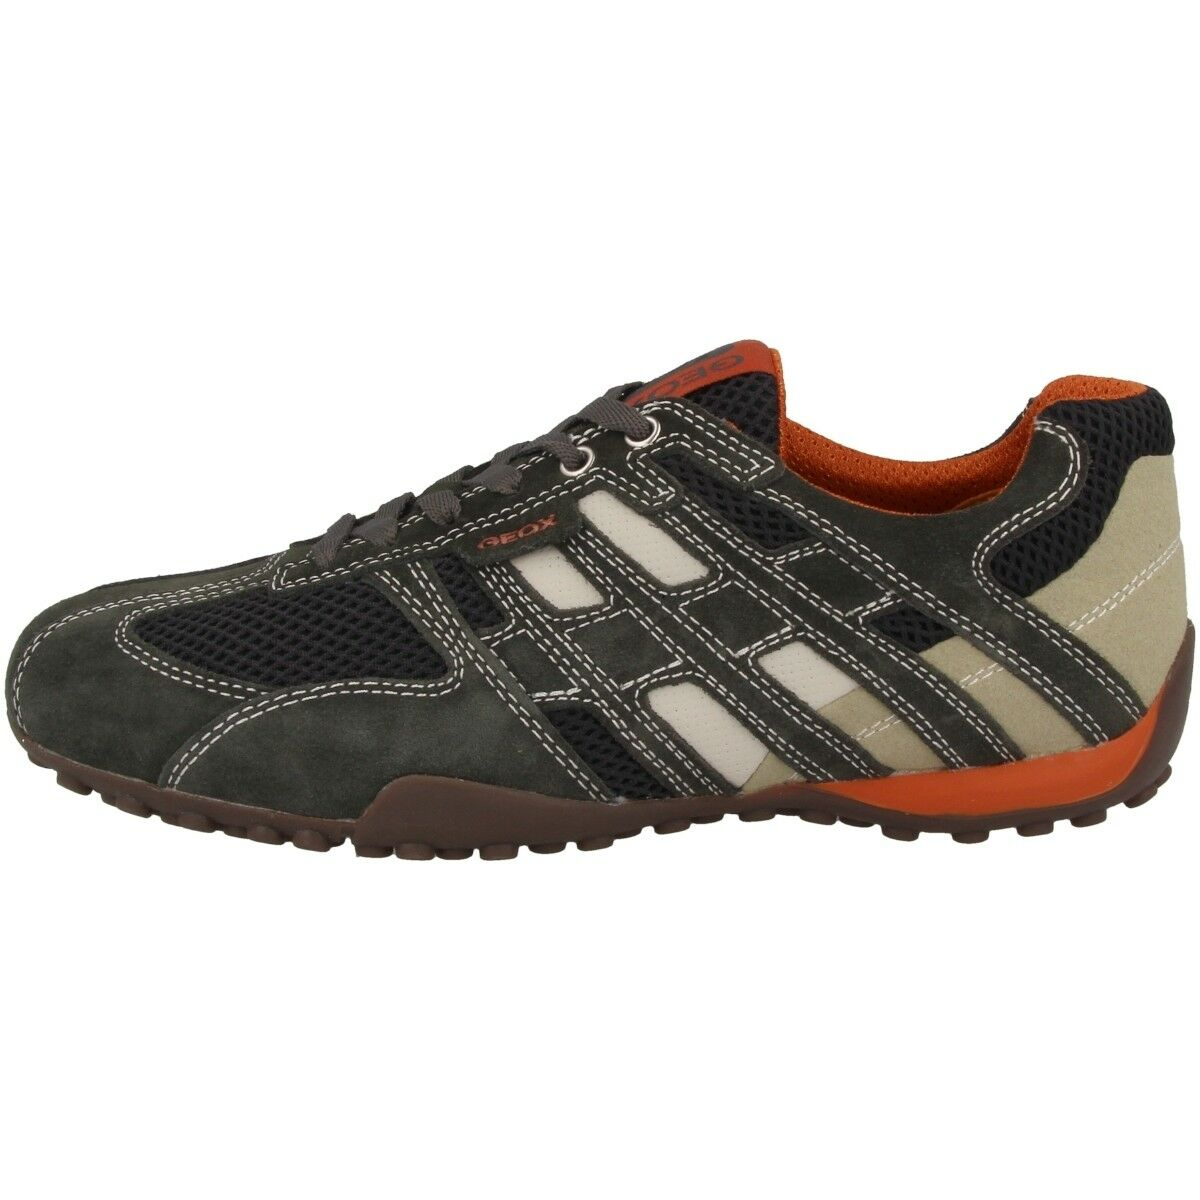 GEOX U Snake K Schuhe Herren Turnschuhe Leder Halbschuhe grau Box U4207K02214C1300   | Modern Und Elegant